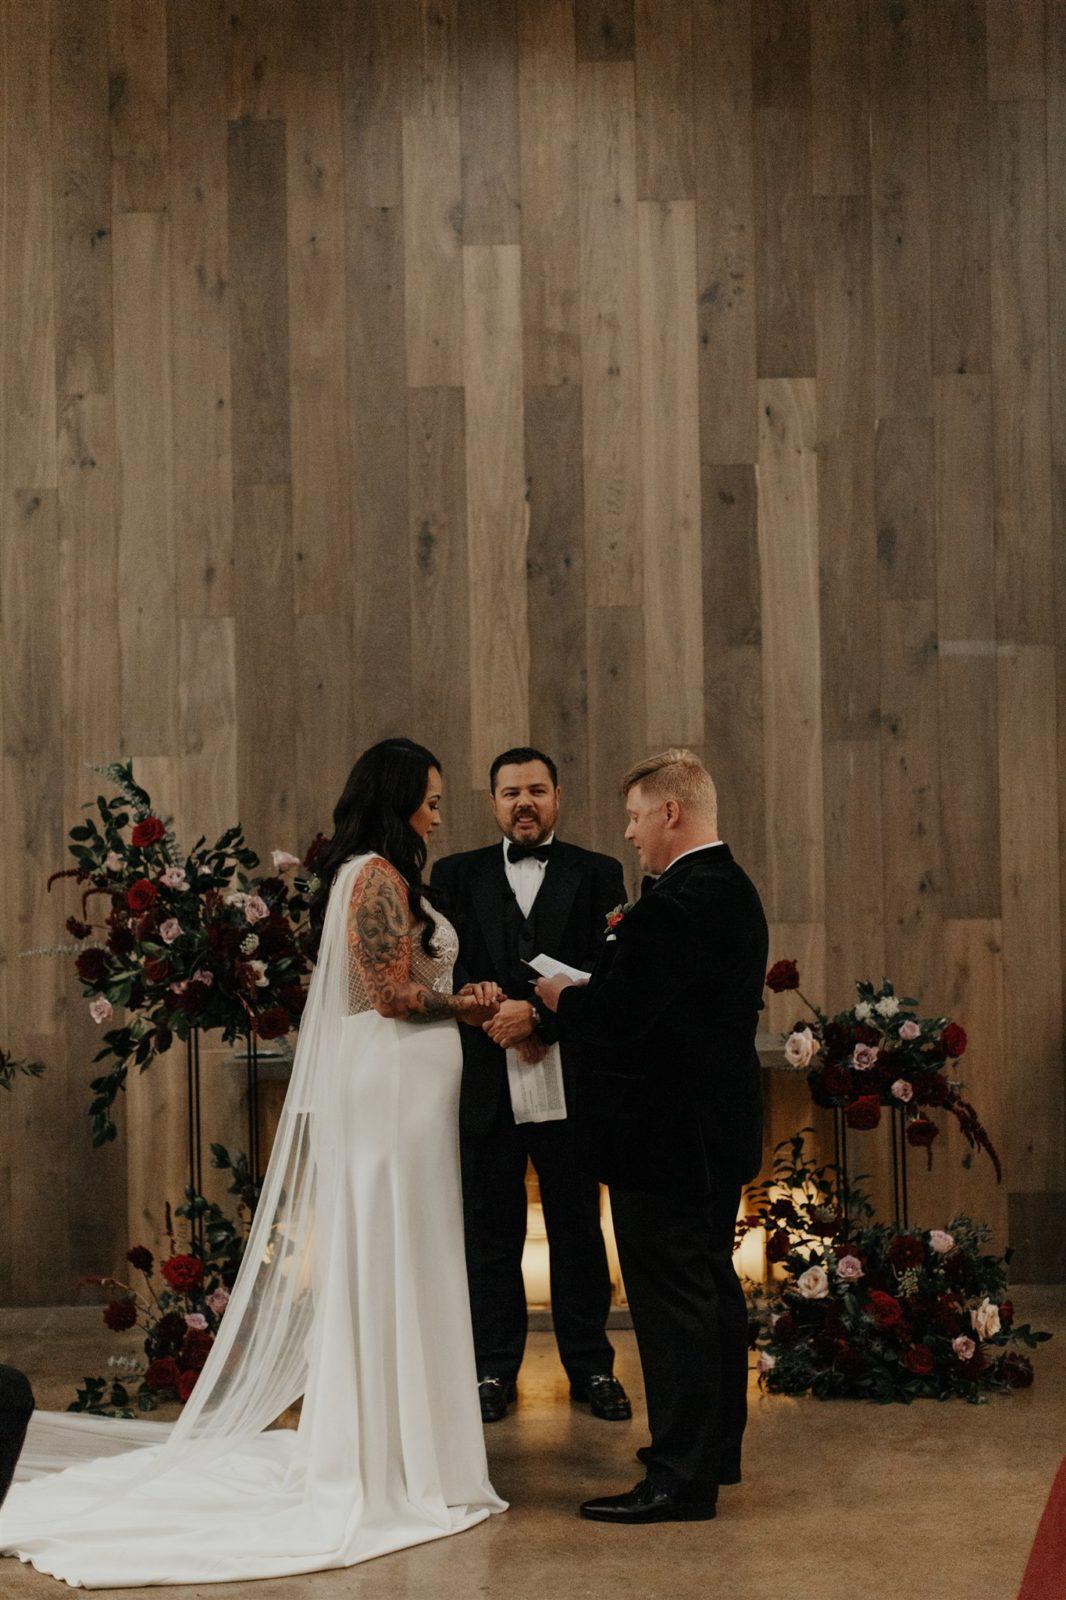 Wedding Ceremony Inspiration for DFW Wedding on Alexa Kay Events